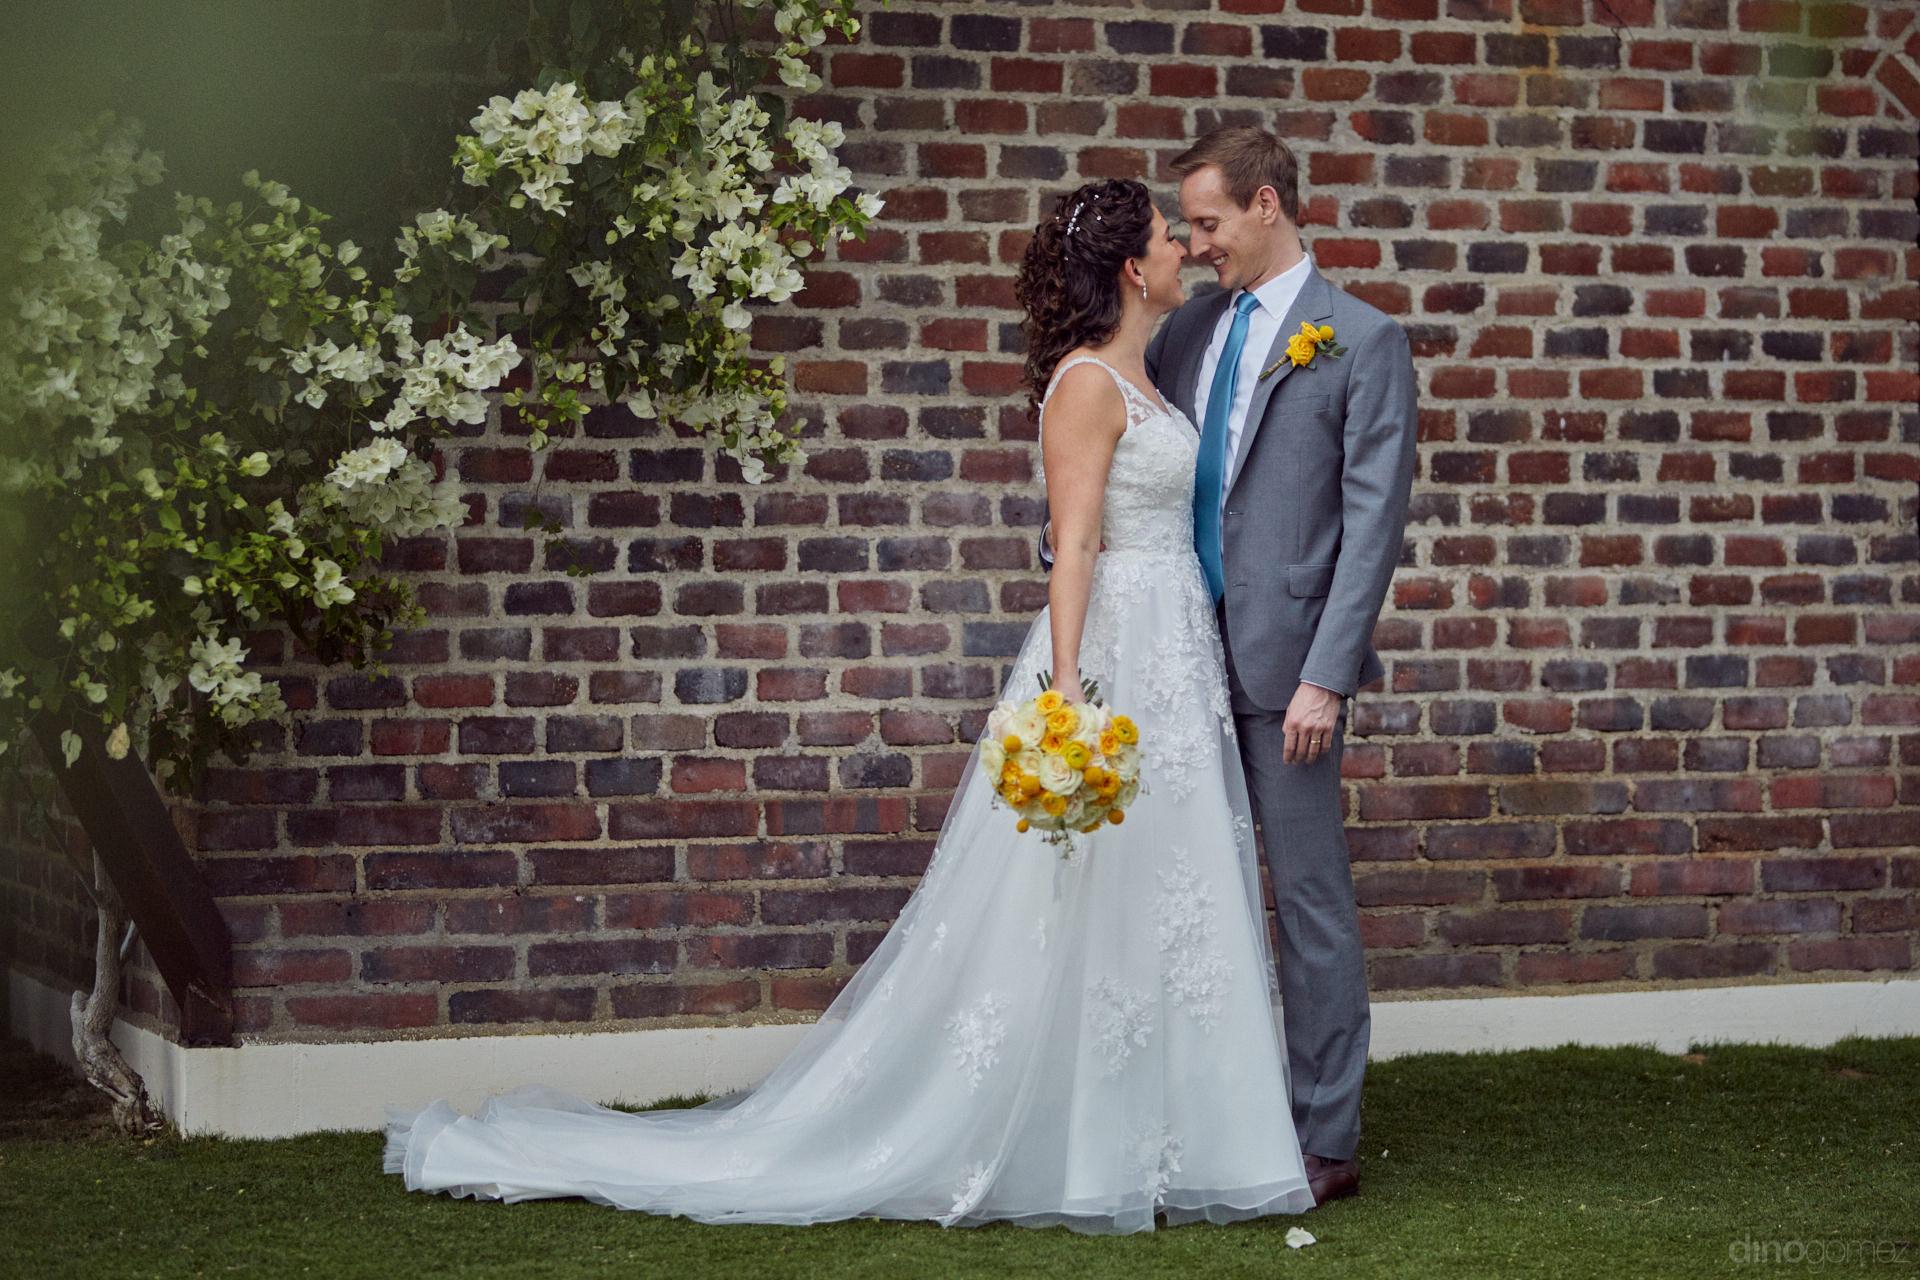 Los Cabos Wedding Locations - Hilary & Bryan Flora Wedding